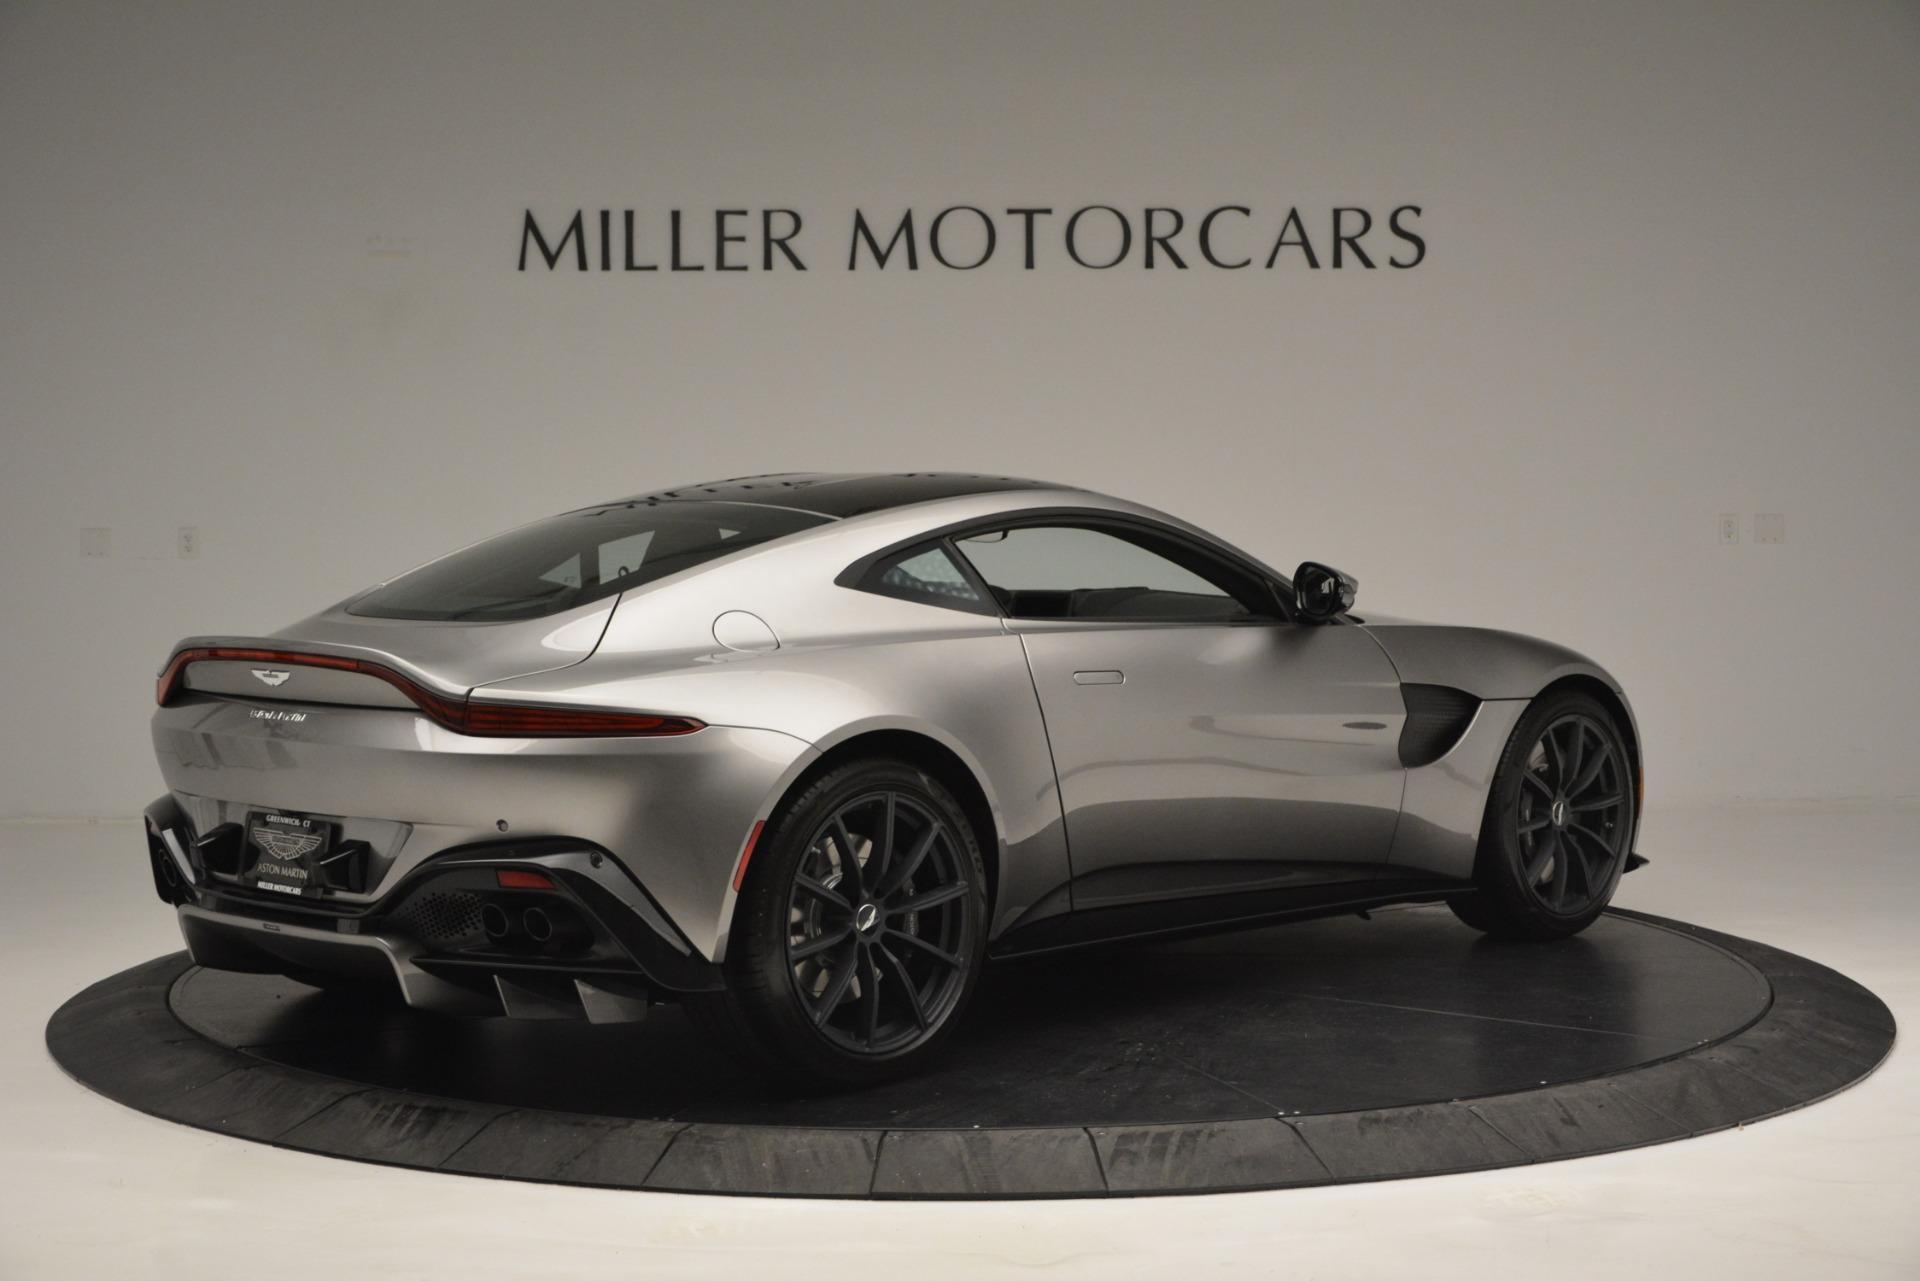 New 2019 Aston Martin Vantage Coupe For Sale In Greenwich, CT. Alfa Romeo of Greenwich, A1335 3122_p8